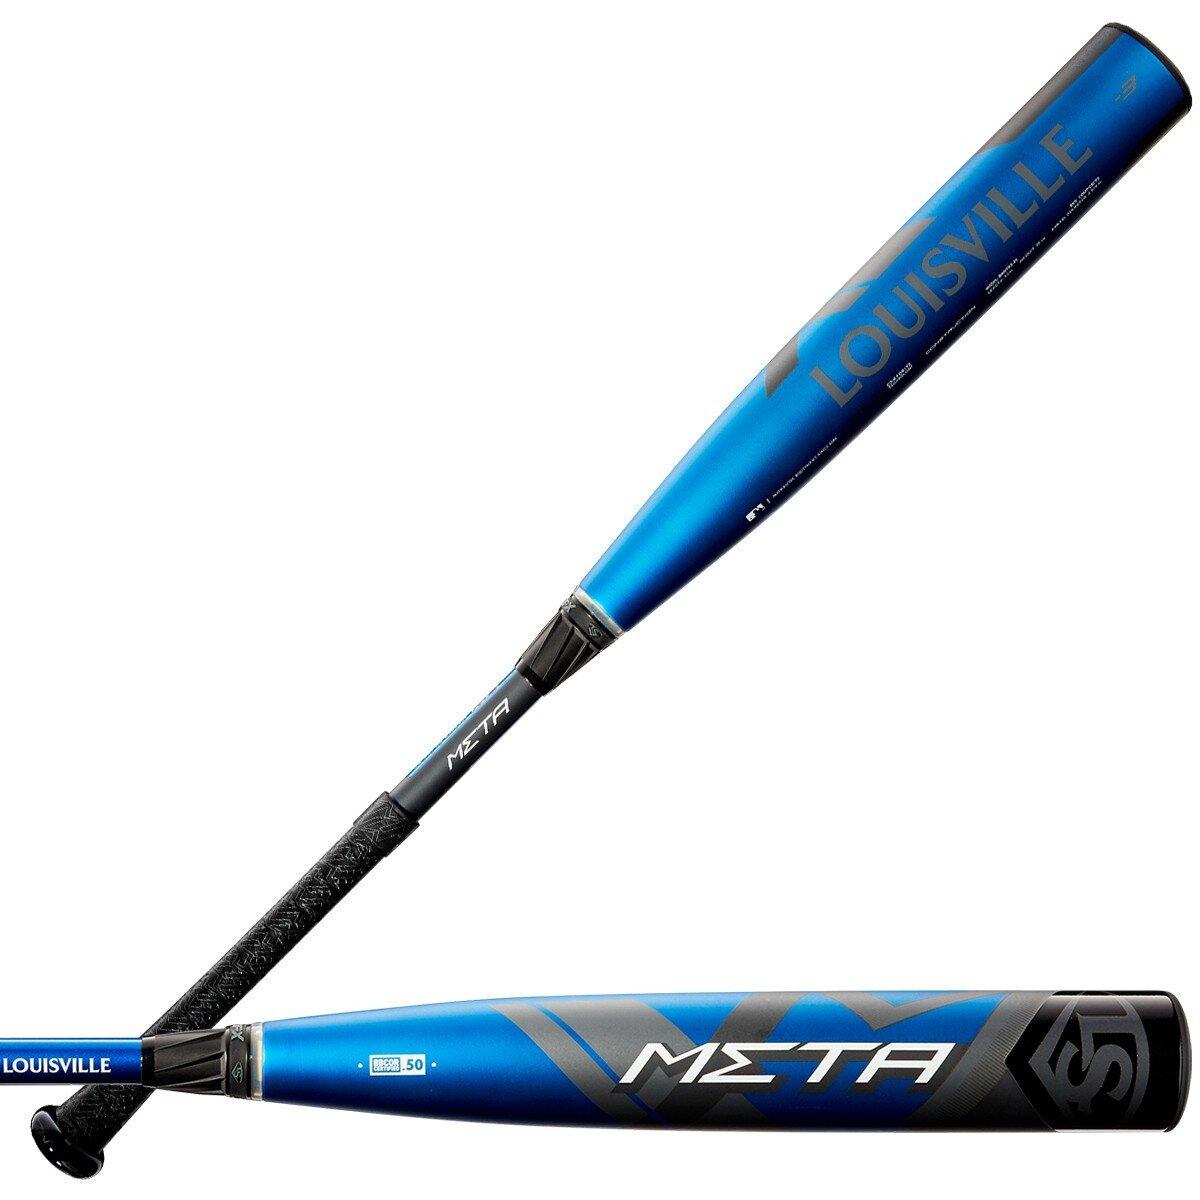 On-Deck-Batting-Cages-Wilson-DeMarini-Discount-Blue-Bat.jpg